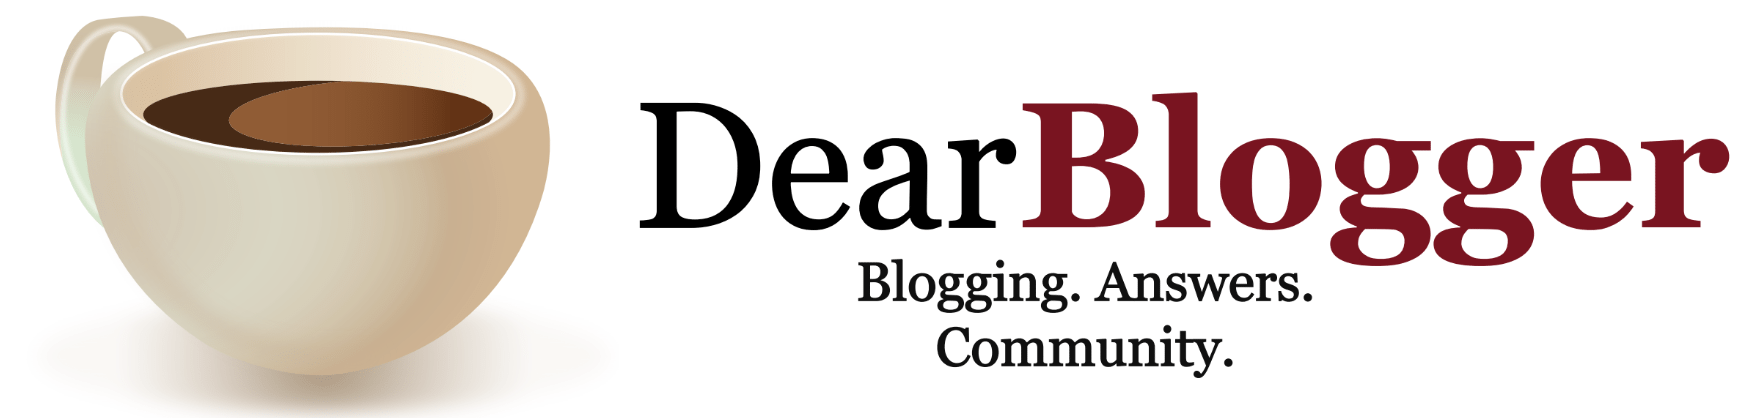 Favourite Createnew 3500 DwarEl3daCafe >> Self Hosted Wordpress Blog Beginner S Guide 2018 Over 3500 Blogs